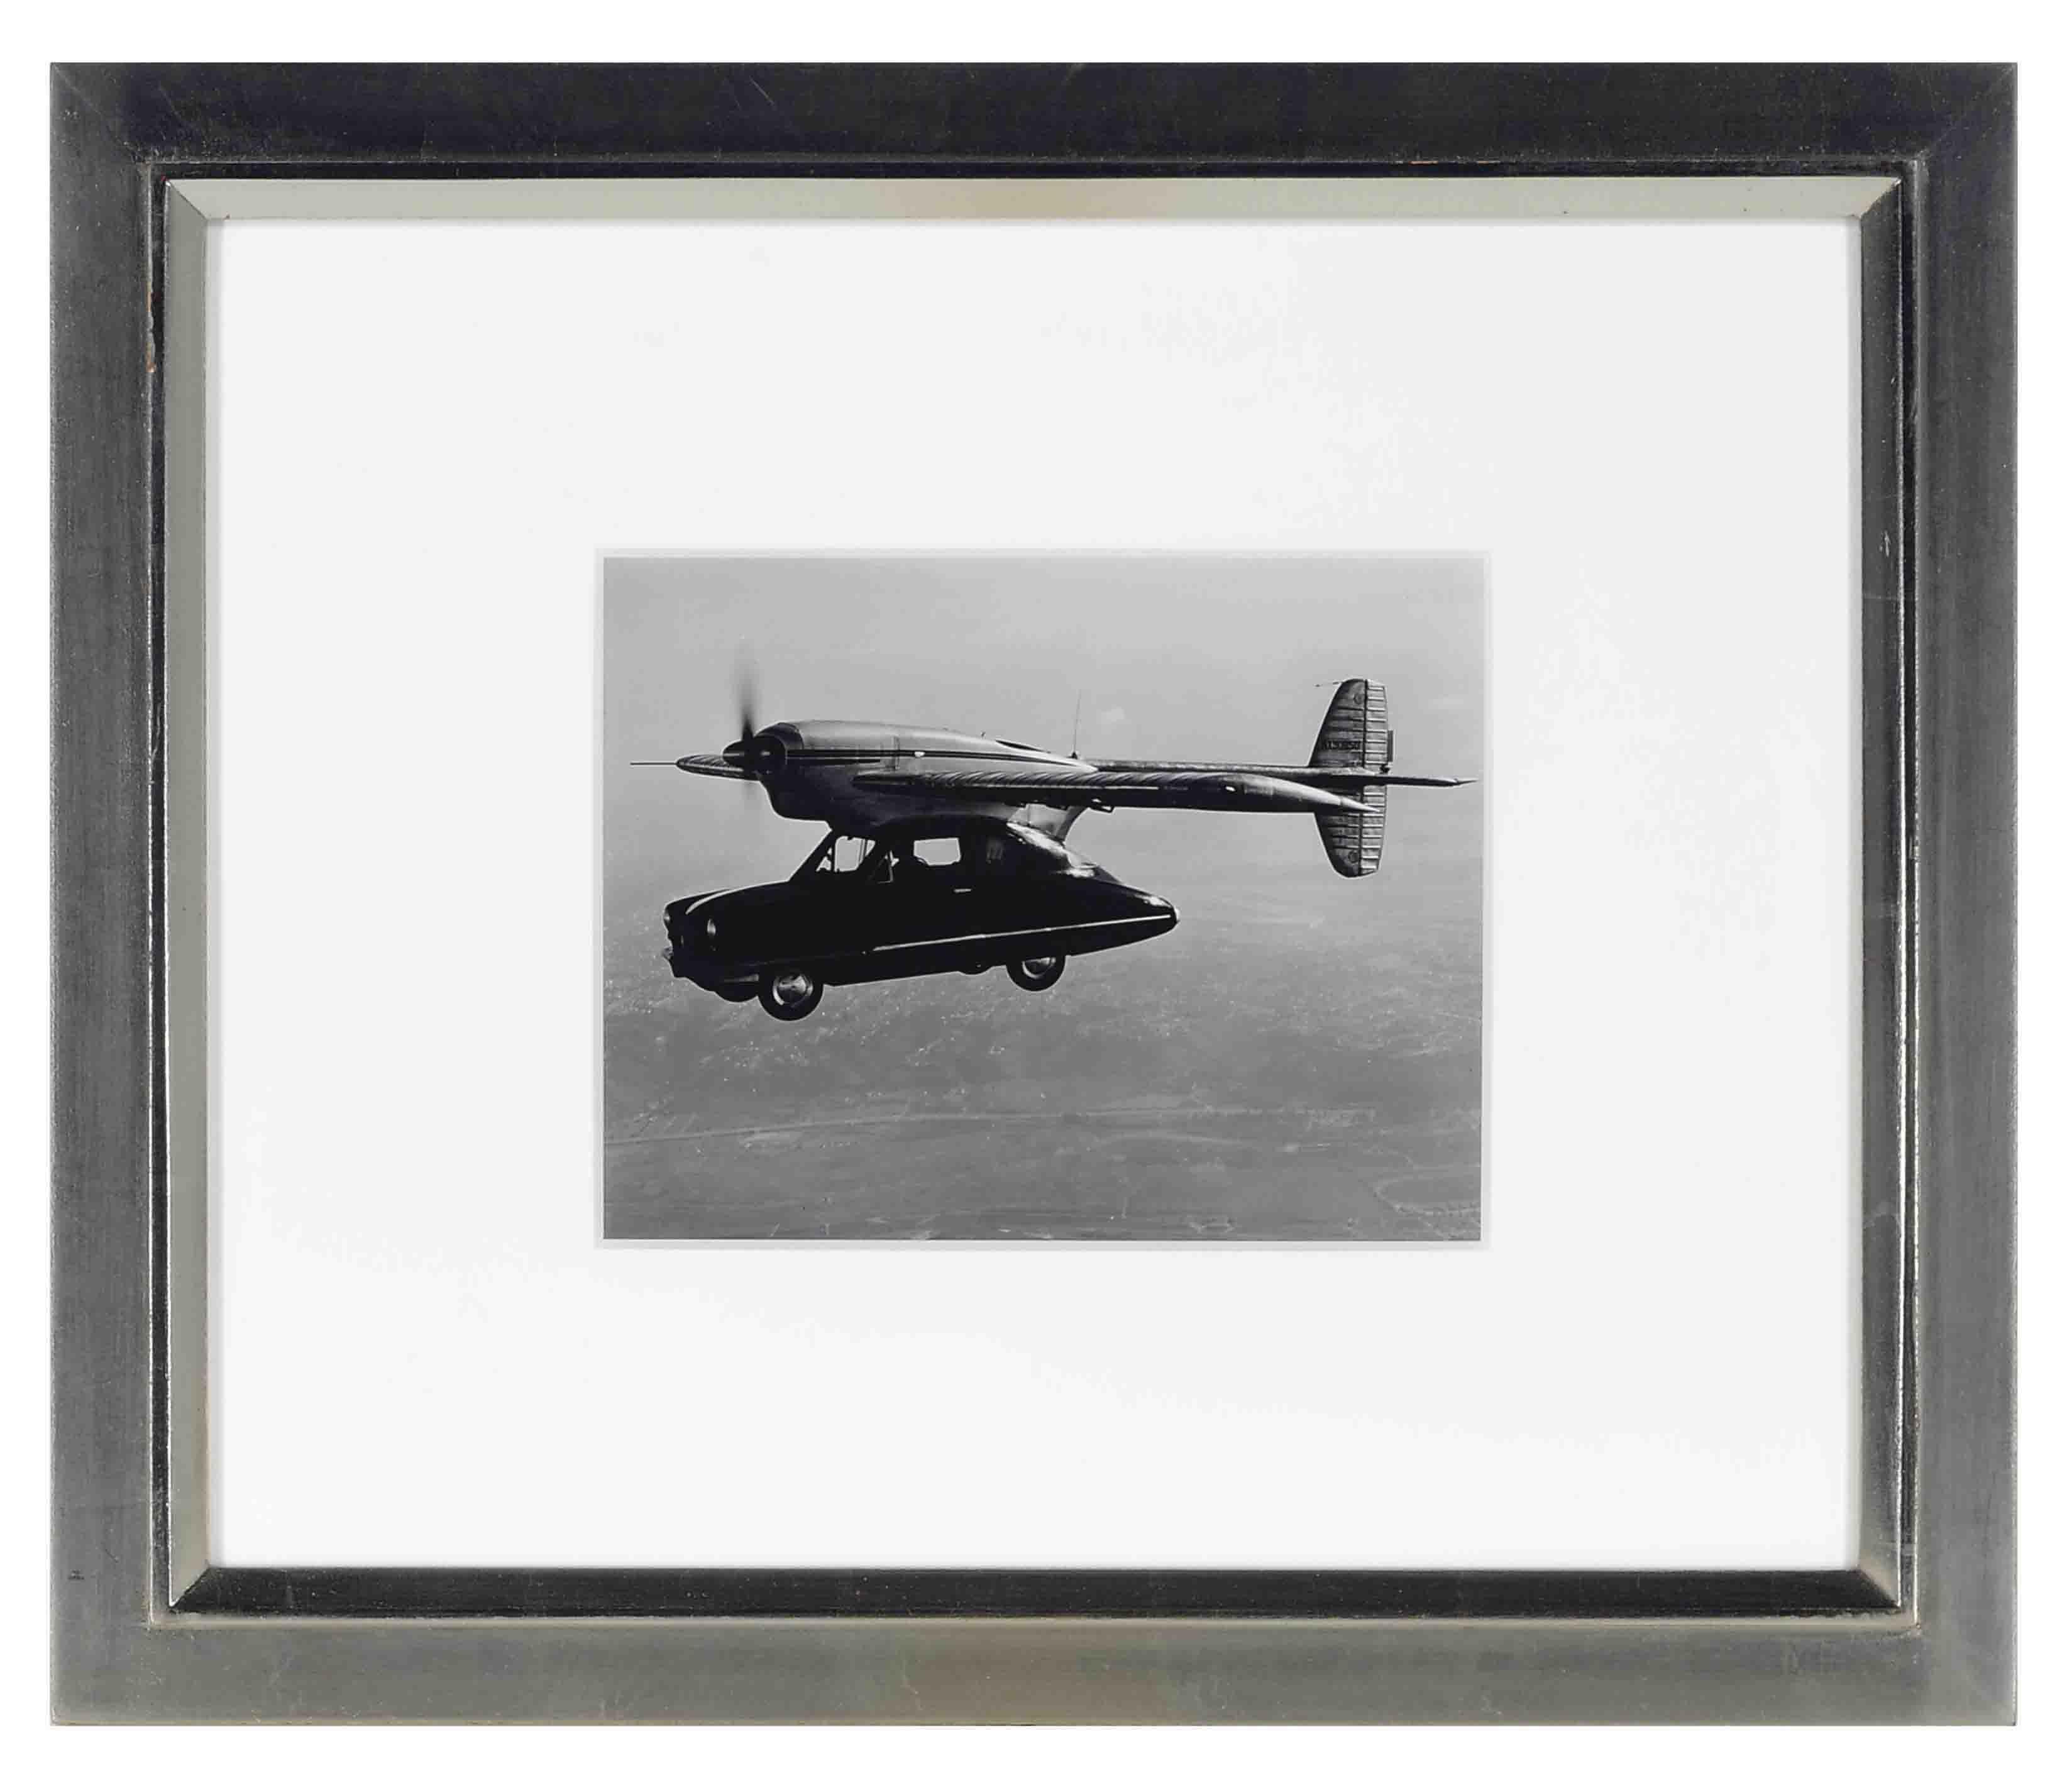 Convoir Flying Auto over San Digeo, California Area, 1948